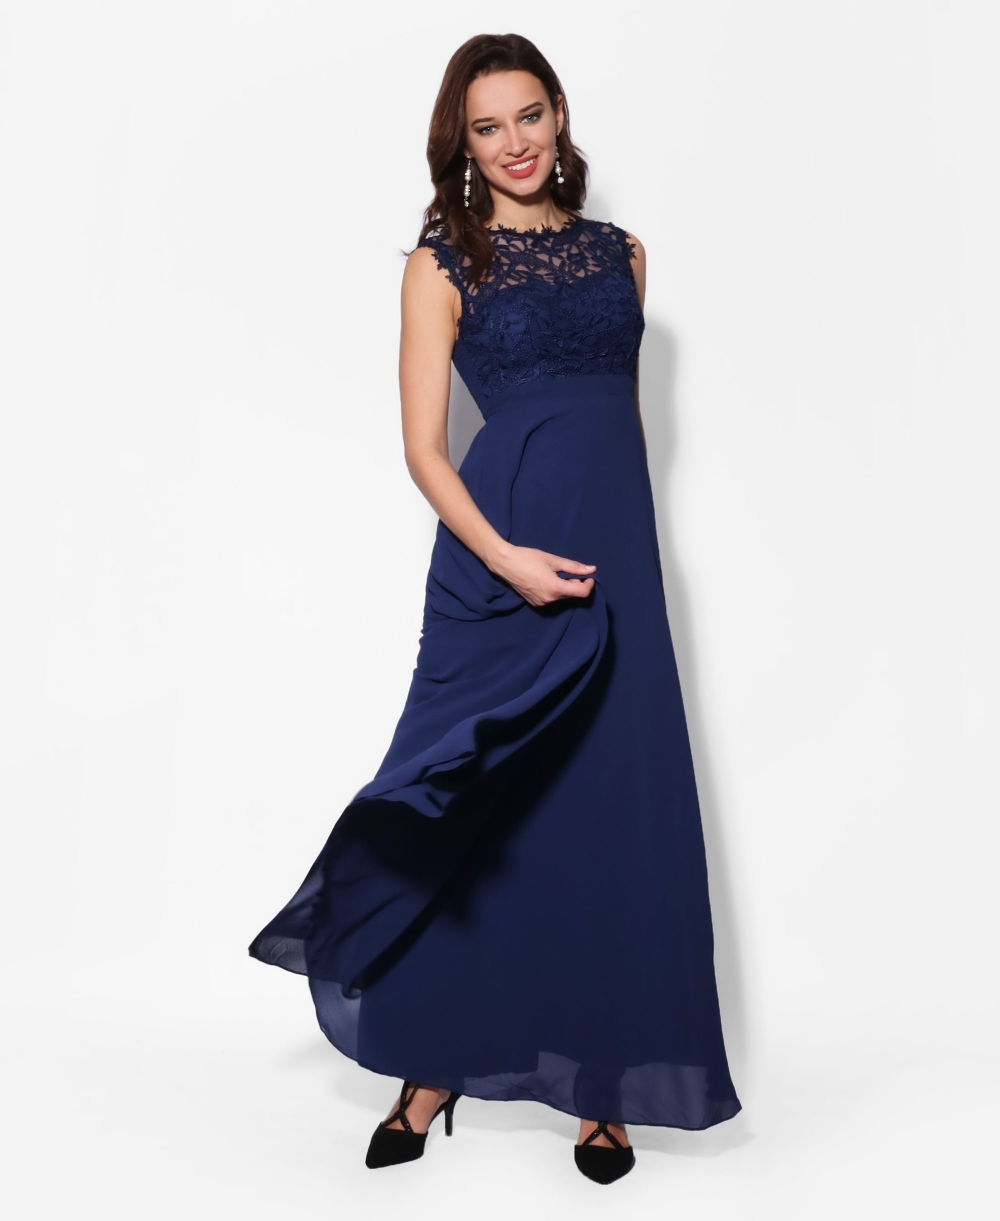 e904bec7 Maxi Dresses | Crochet Lace Chiffon Maxi Dress | KRISP